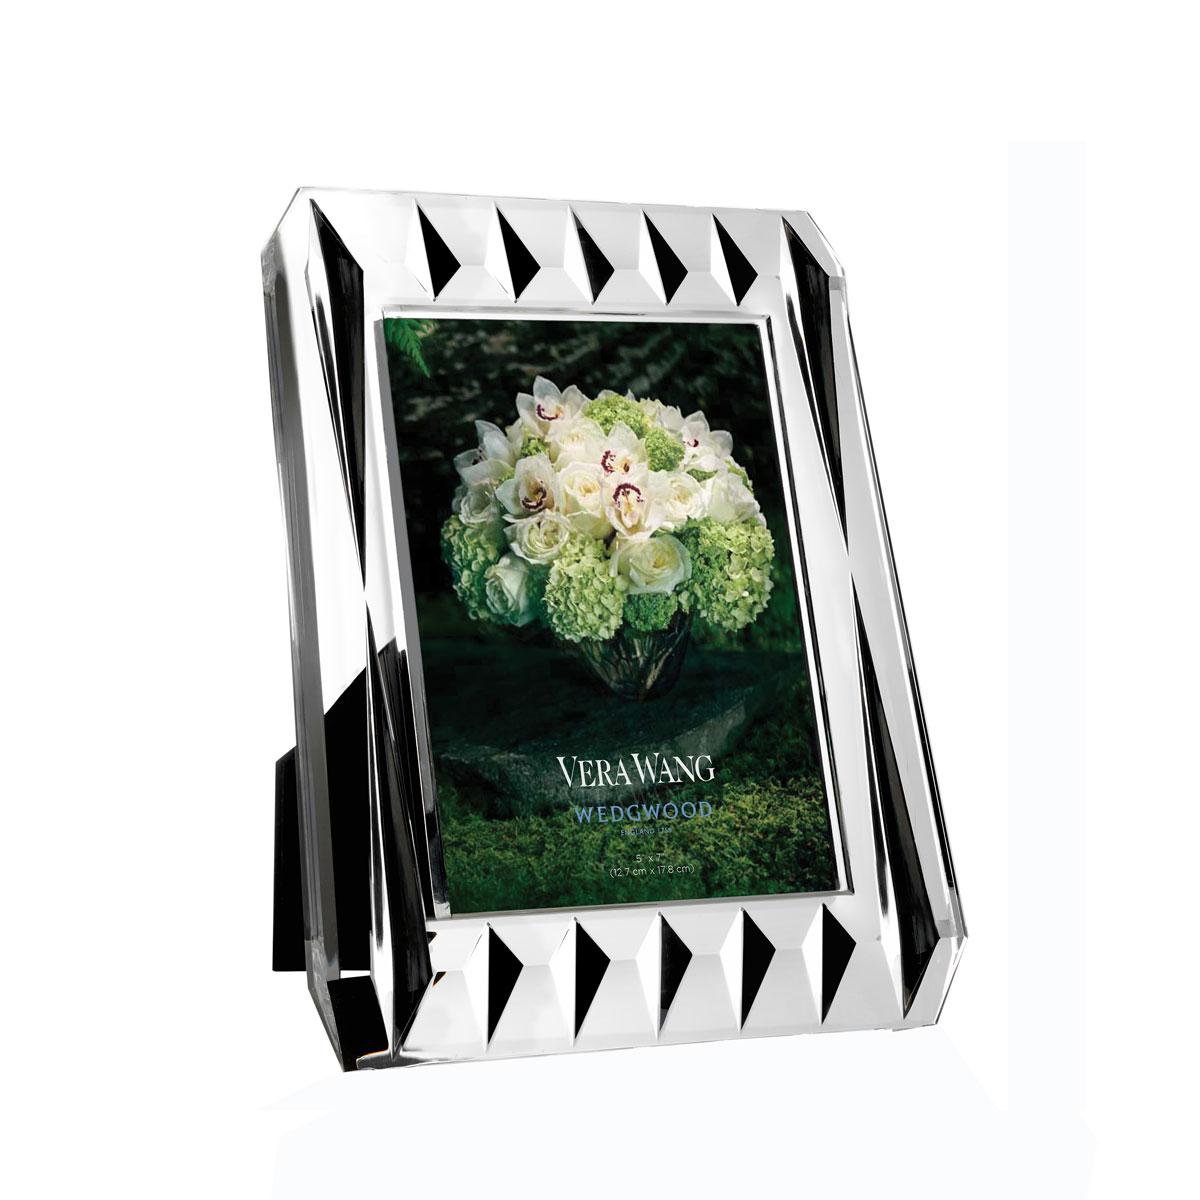 "Vera Wang Wedgwood, Vera Peplum 5x7"" Picture Frame"